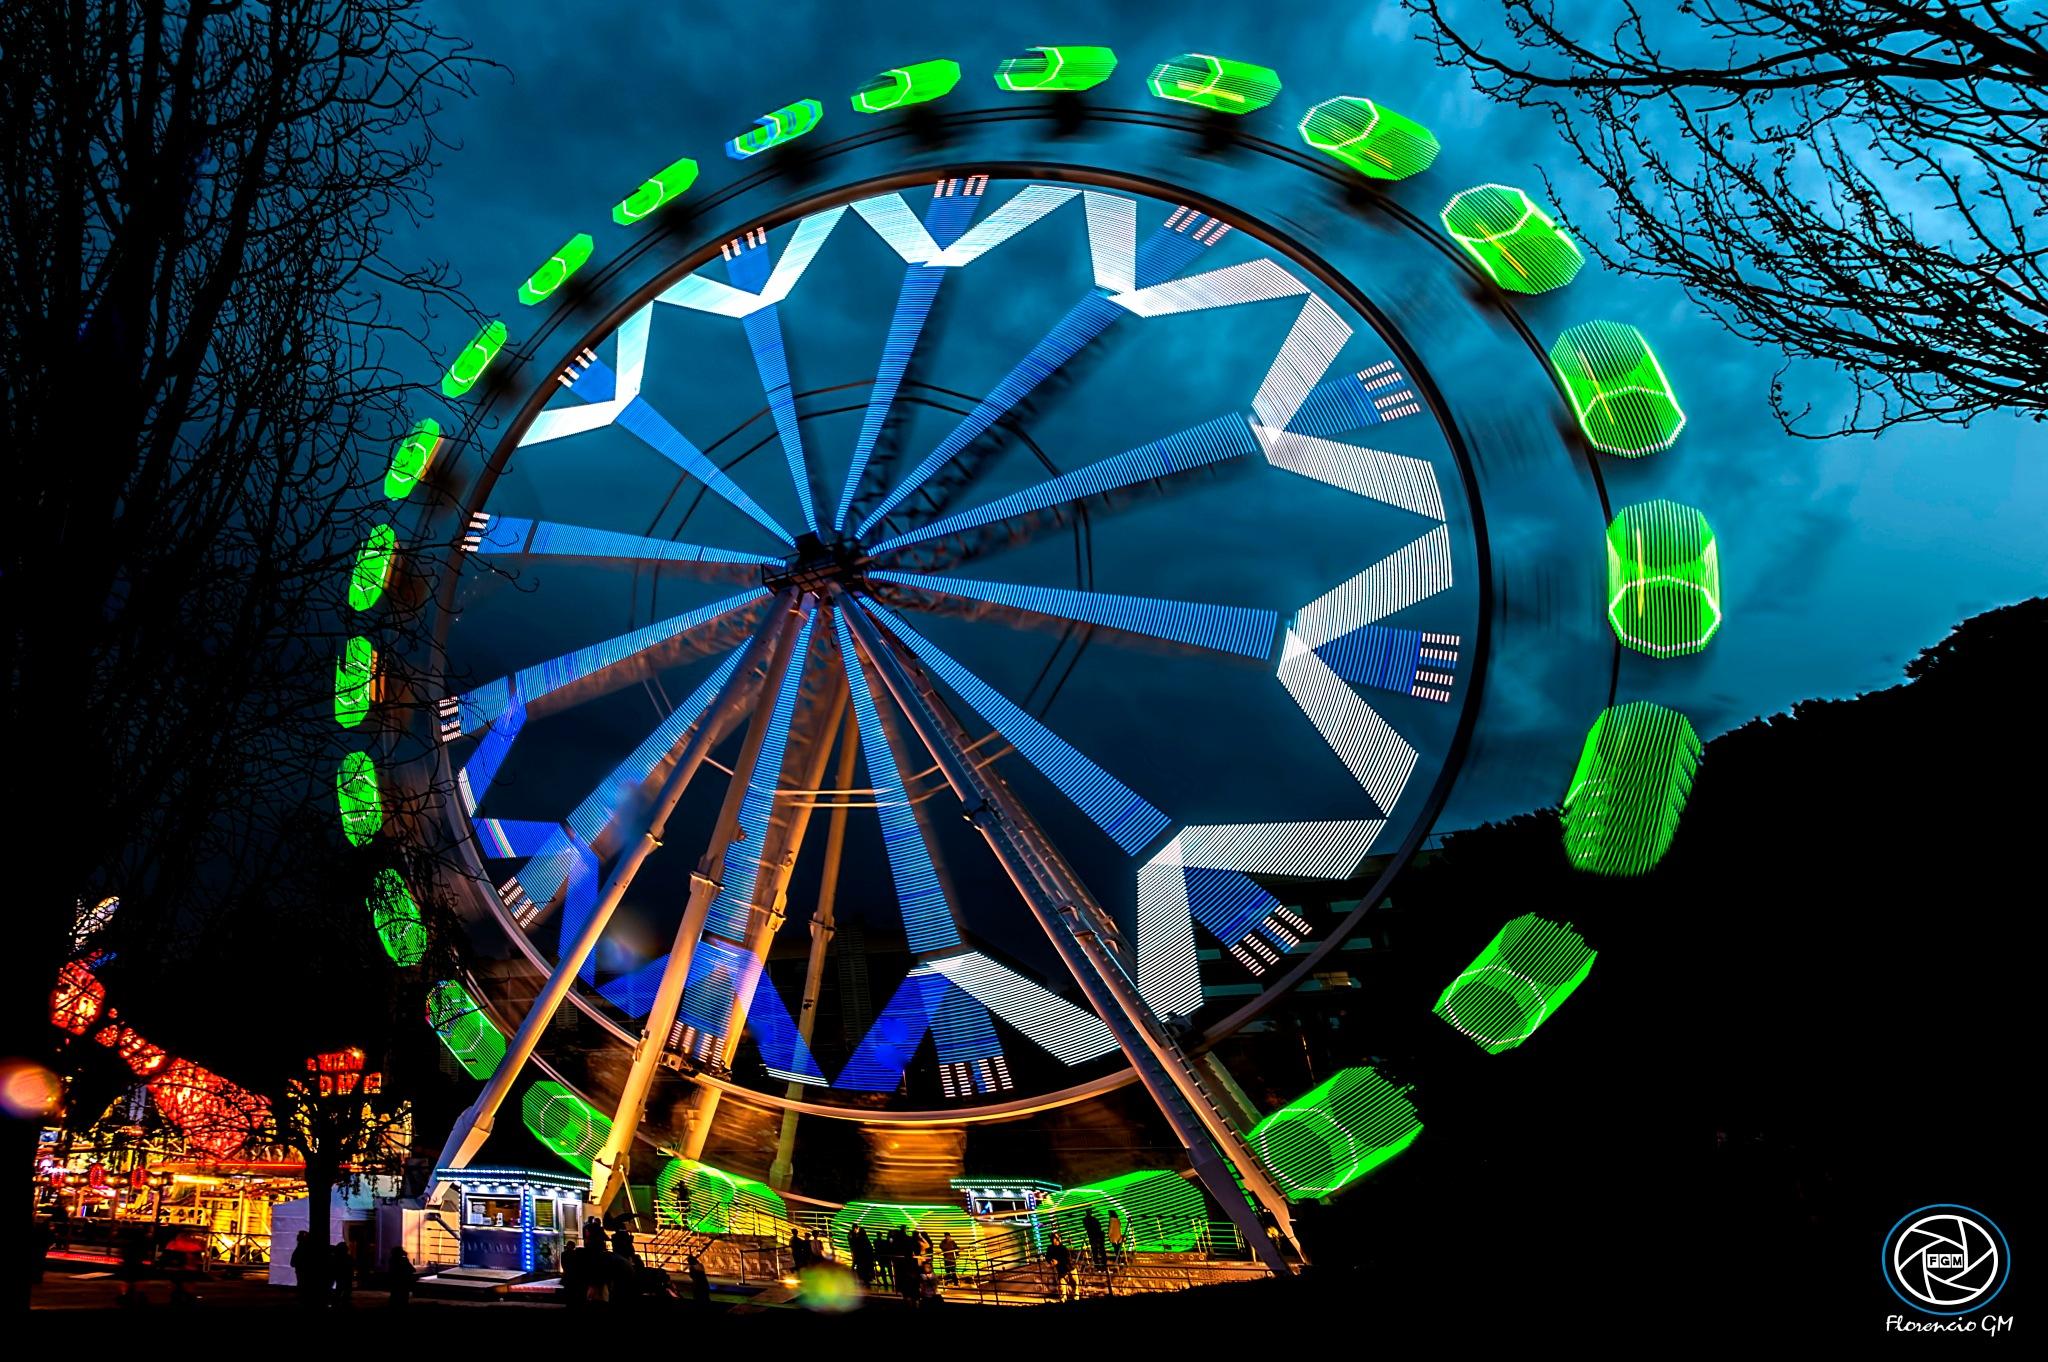 The Ferris wheel by Florencio GM